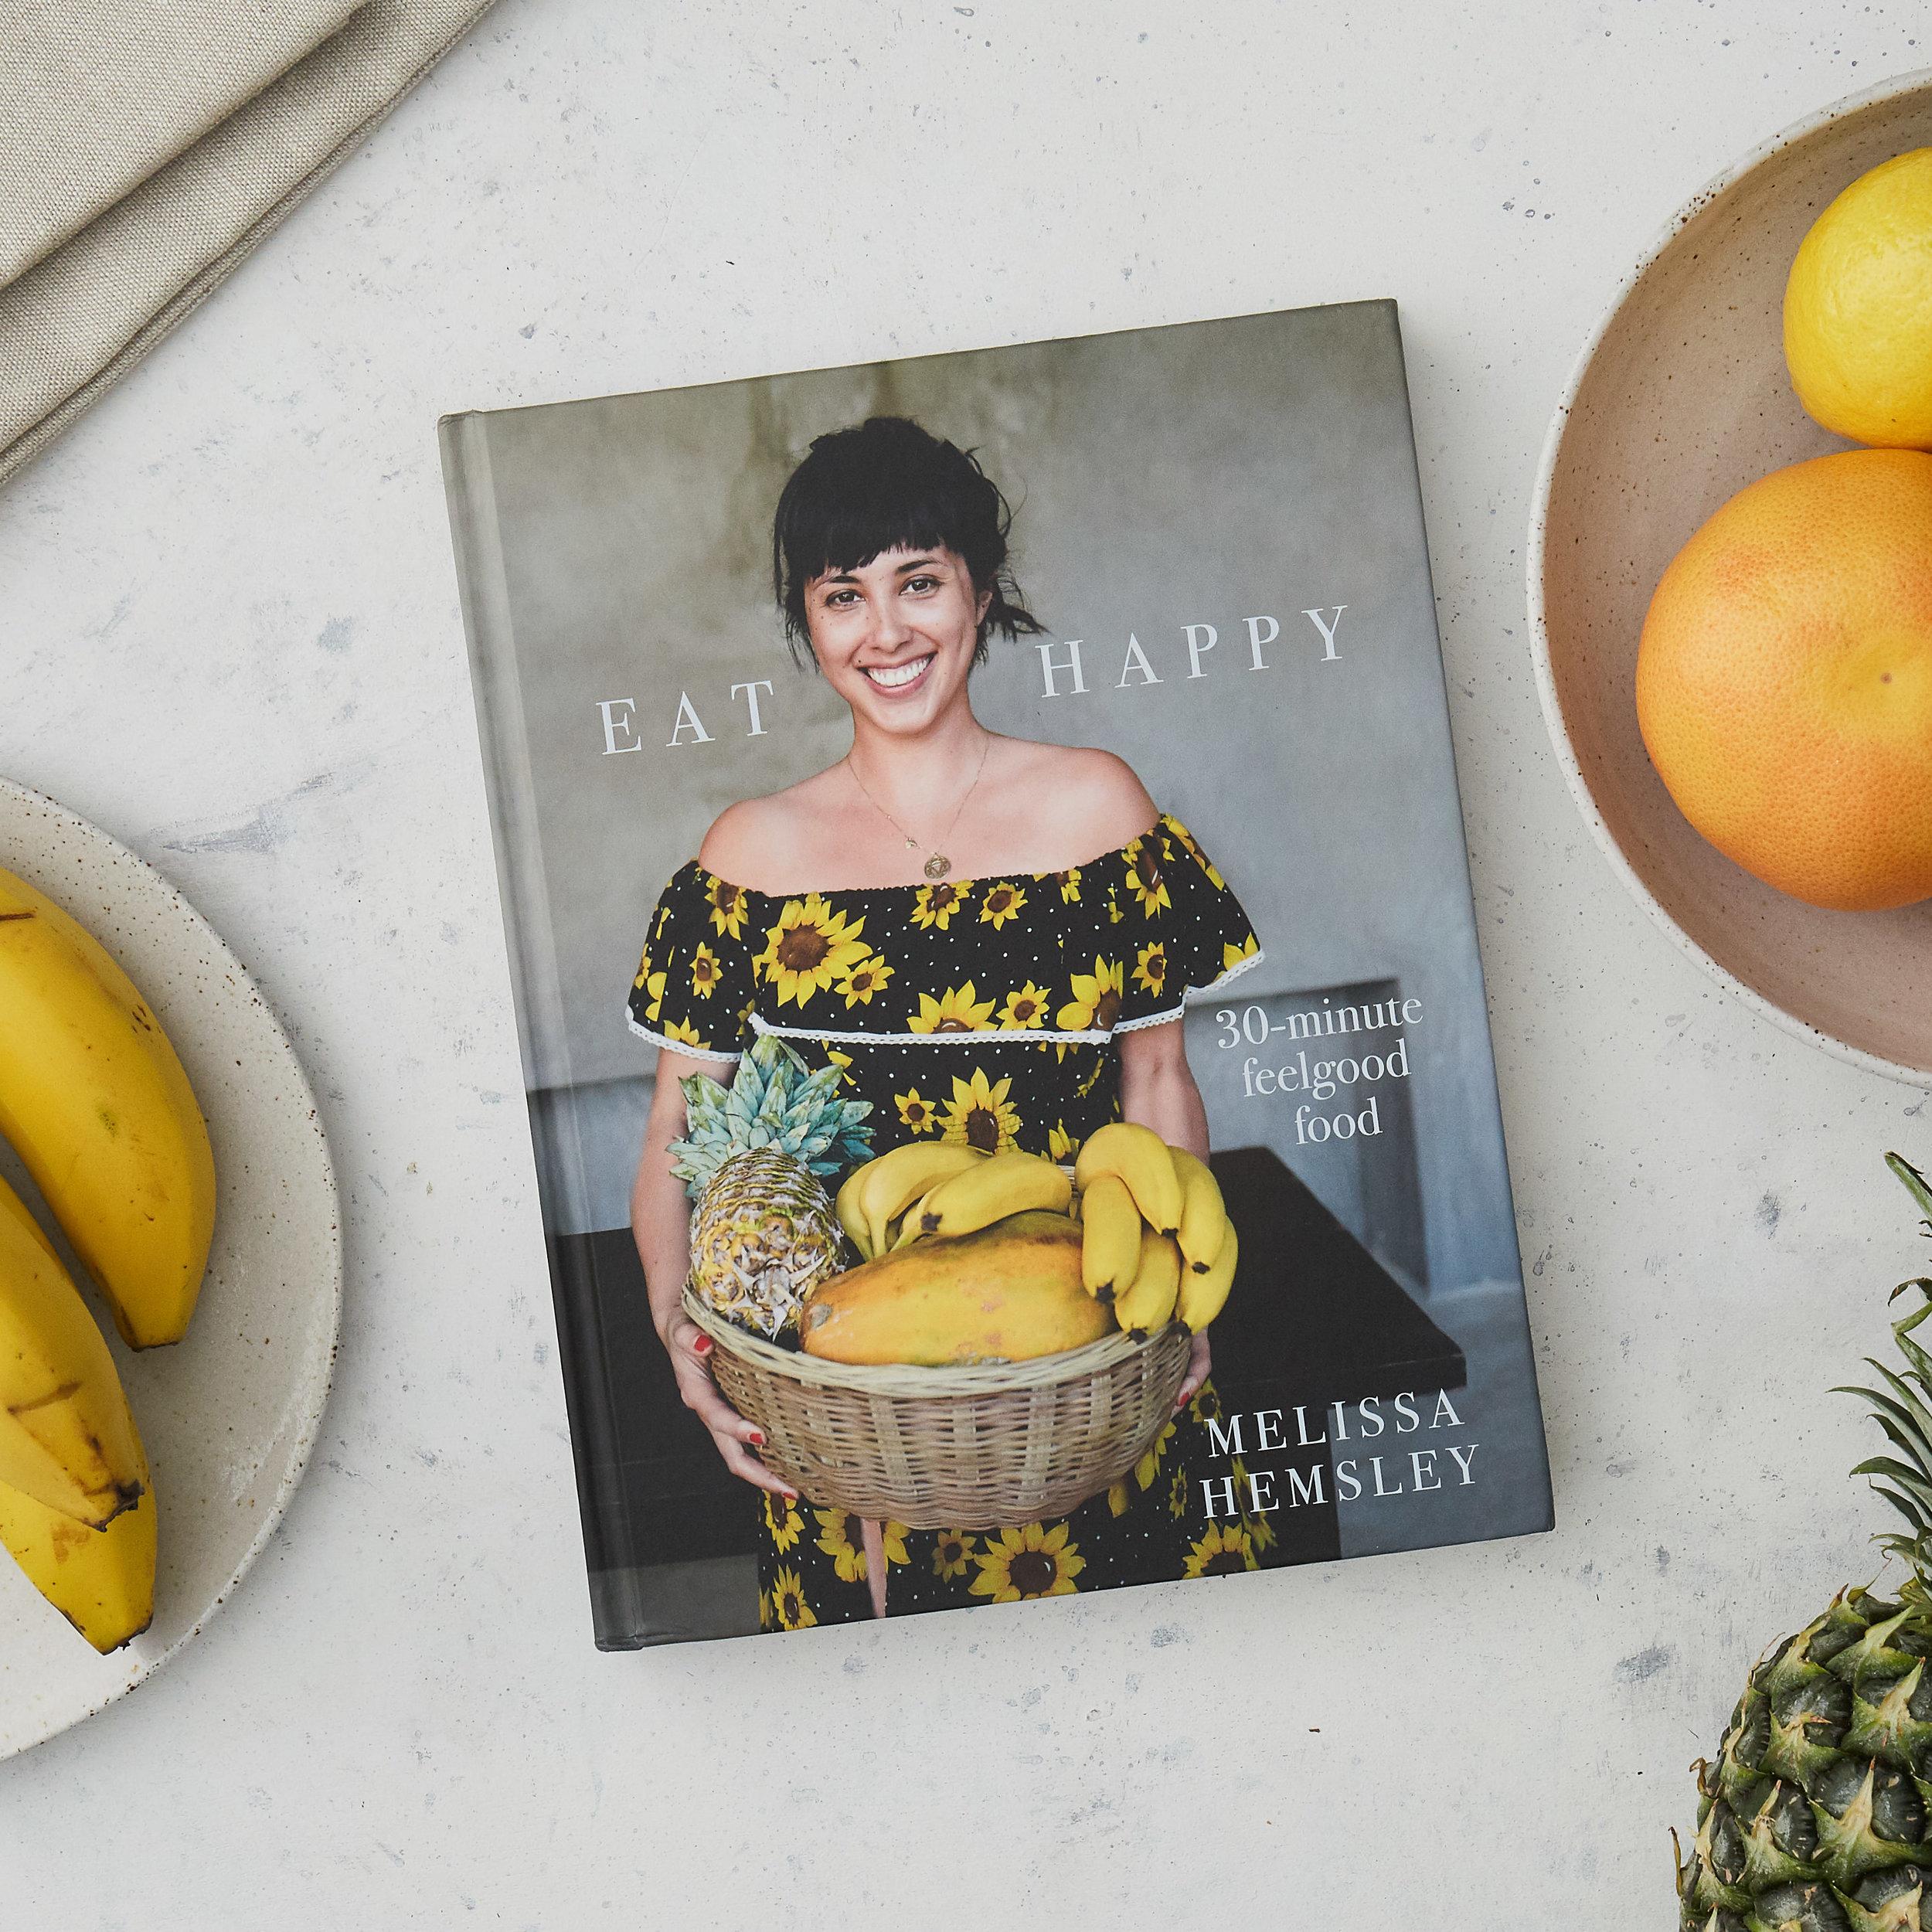 Ebury-Eat-Happy-2.12.1725407.jpg